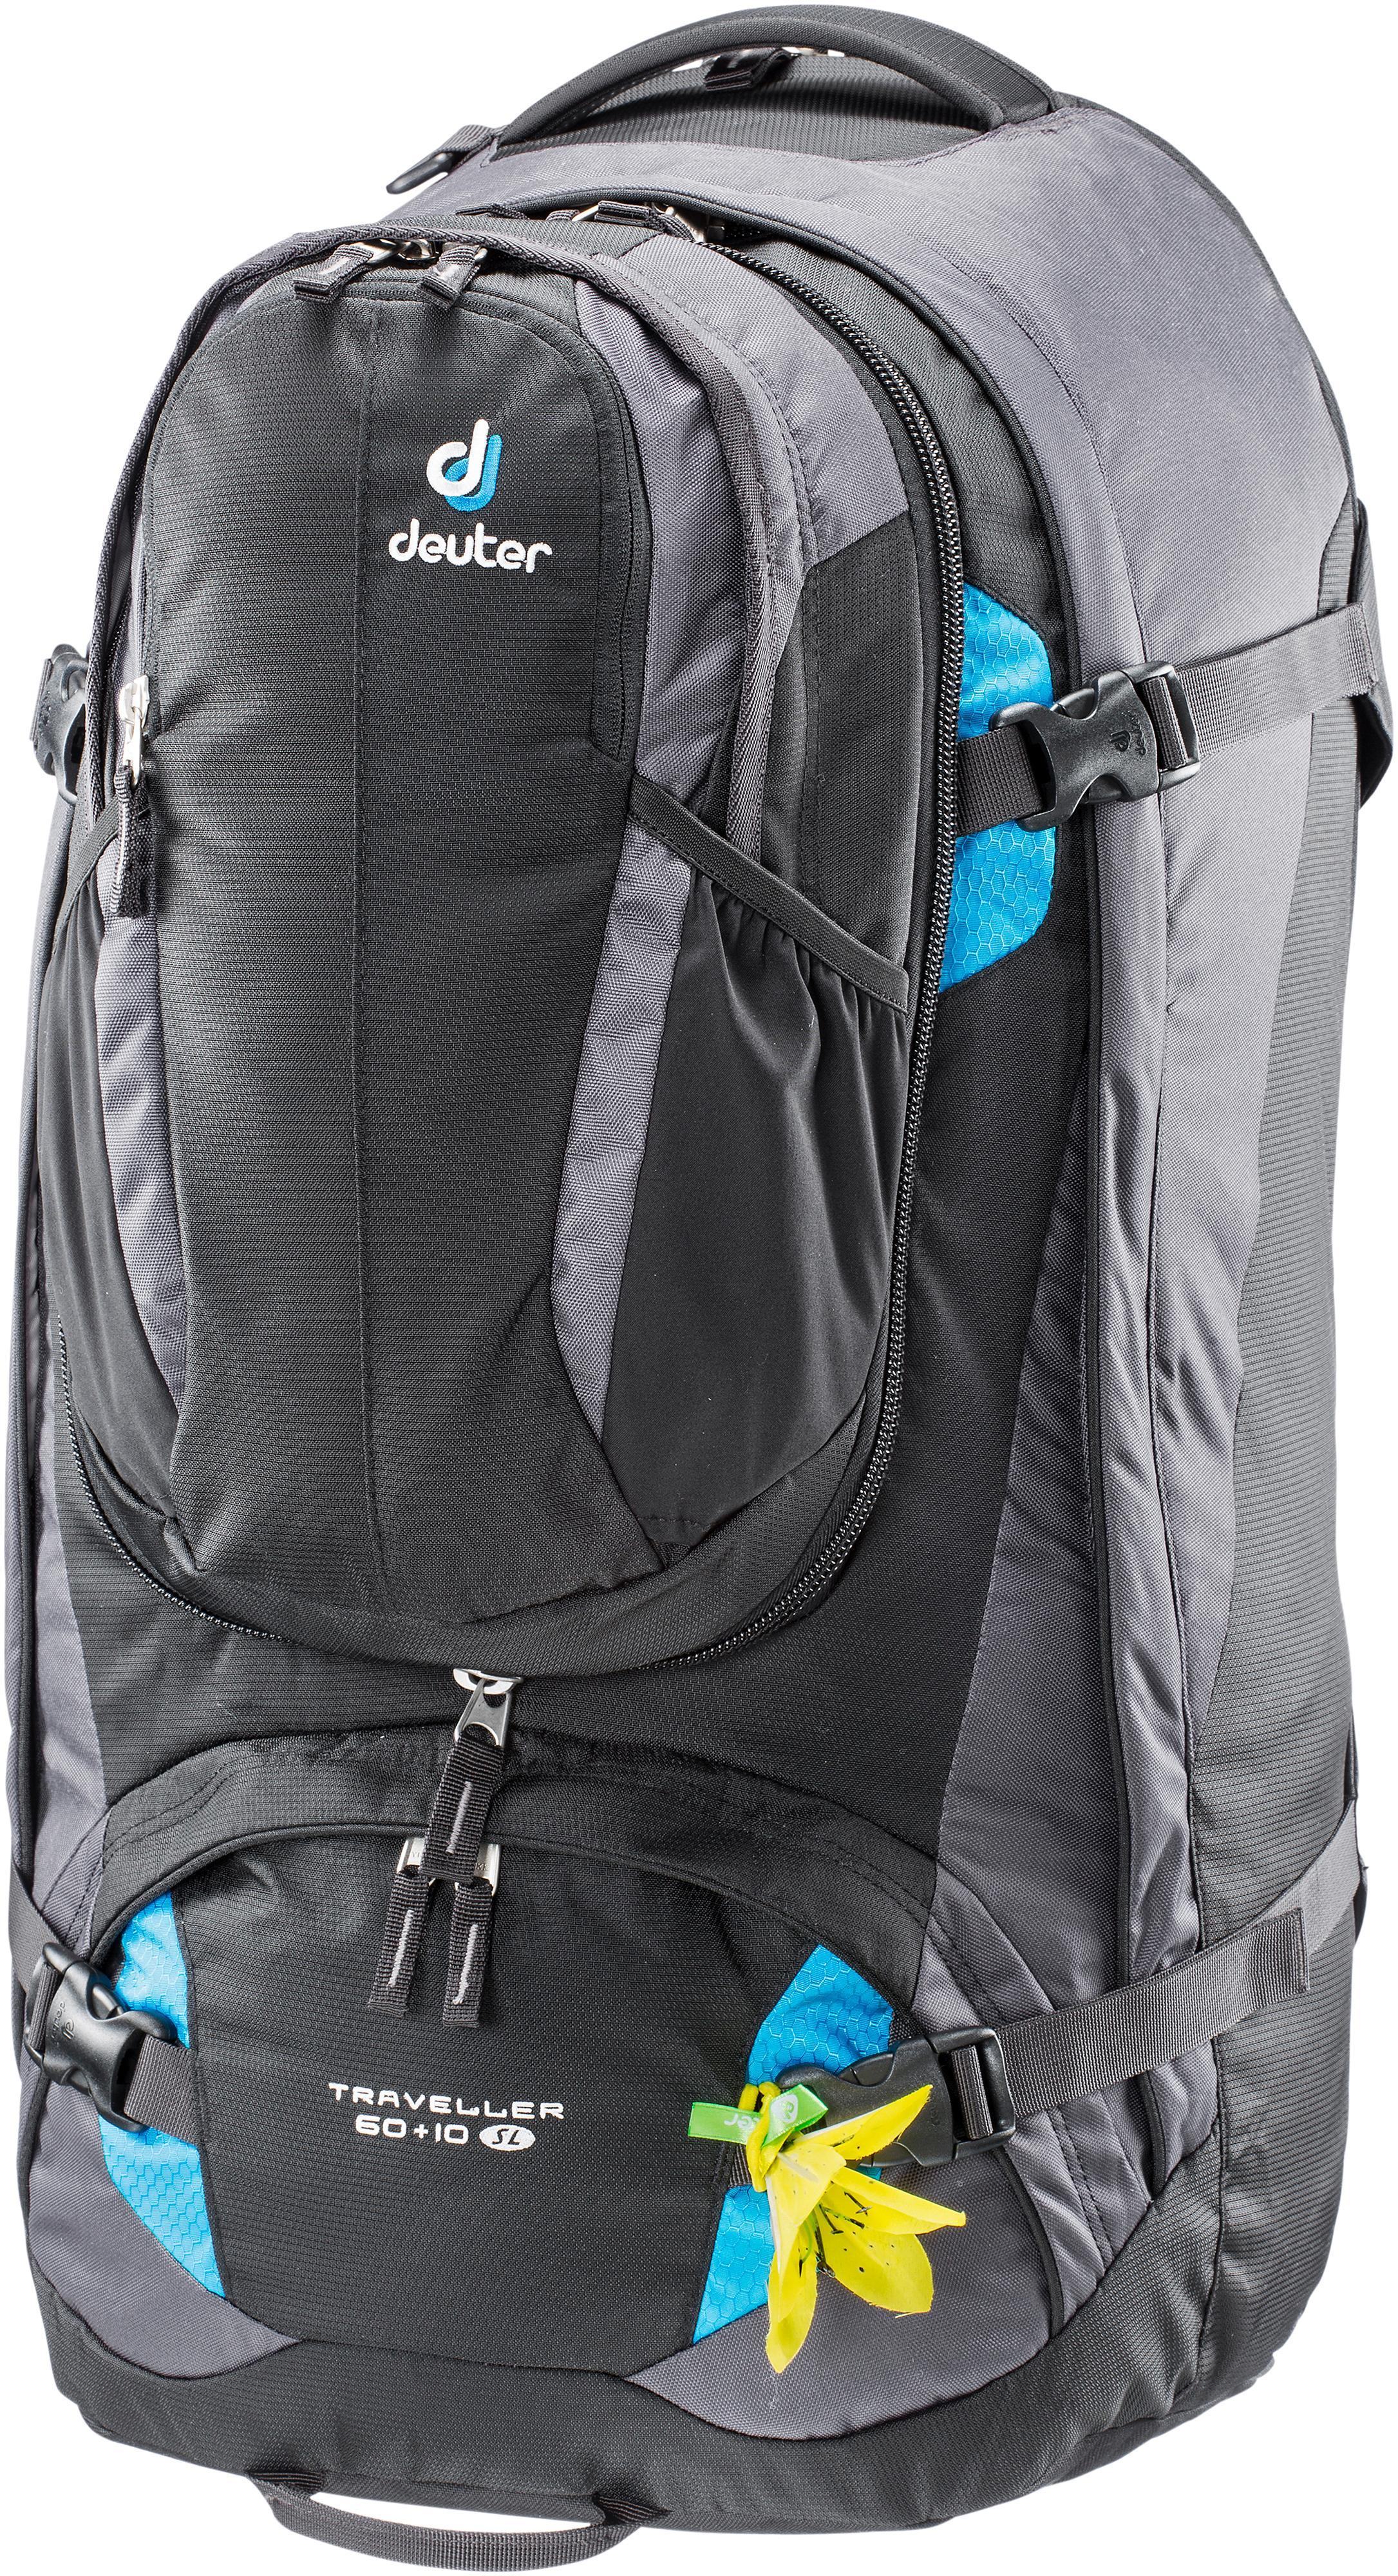 Deuter Damen Traveller 60 Plus 10 SL Rucksack Backpack Sportrucksack Mehrfarbig